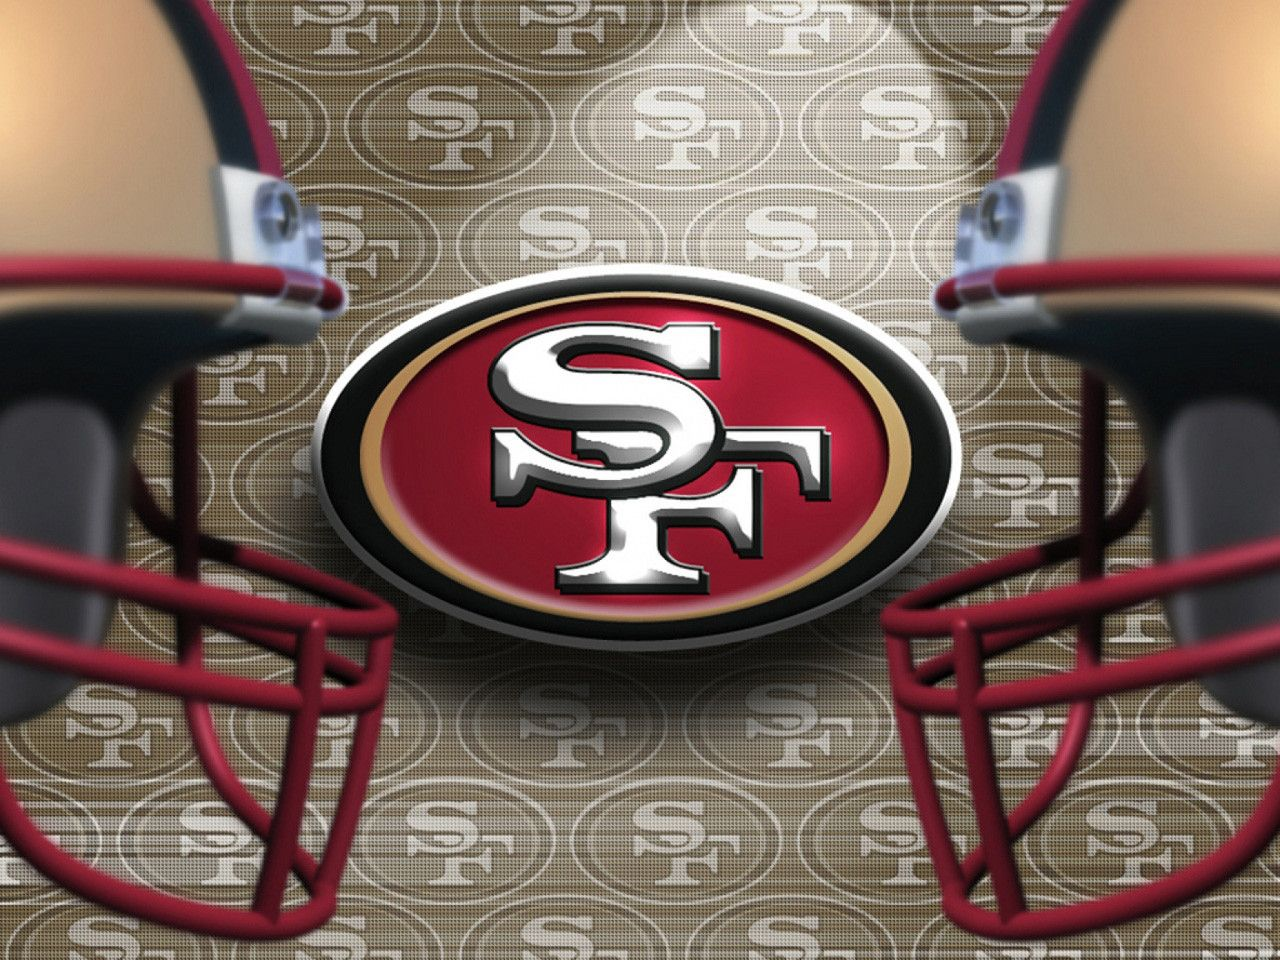 San Francisco 49ers Wallpapers 2015 1280x960